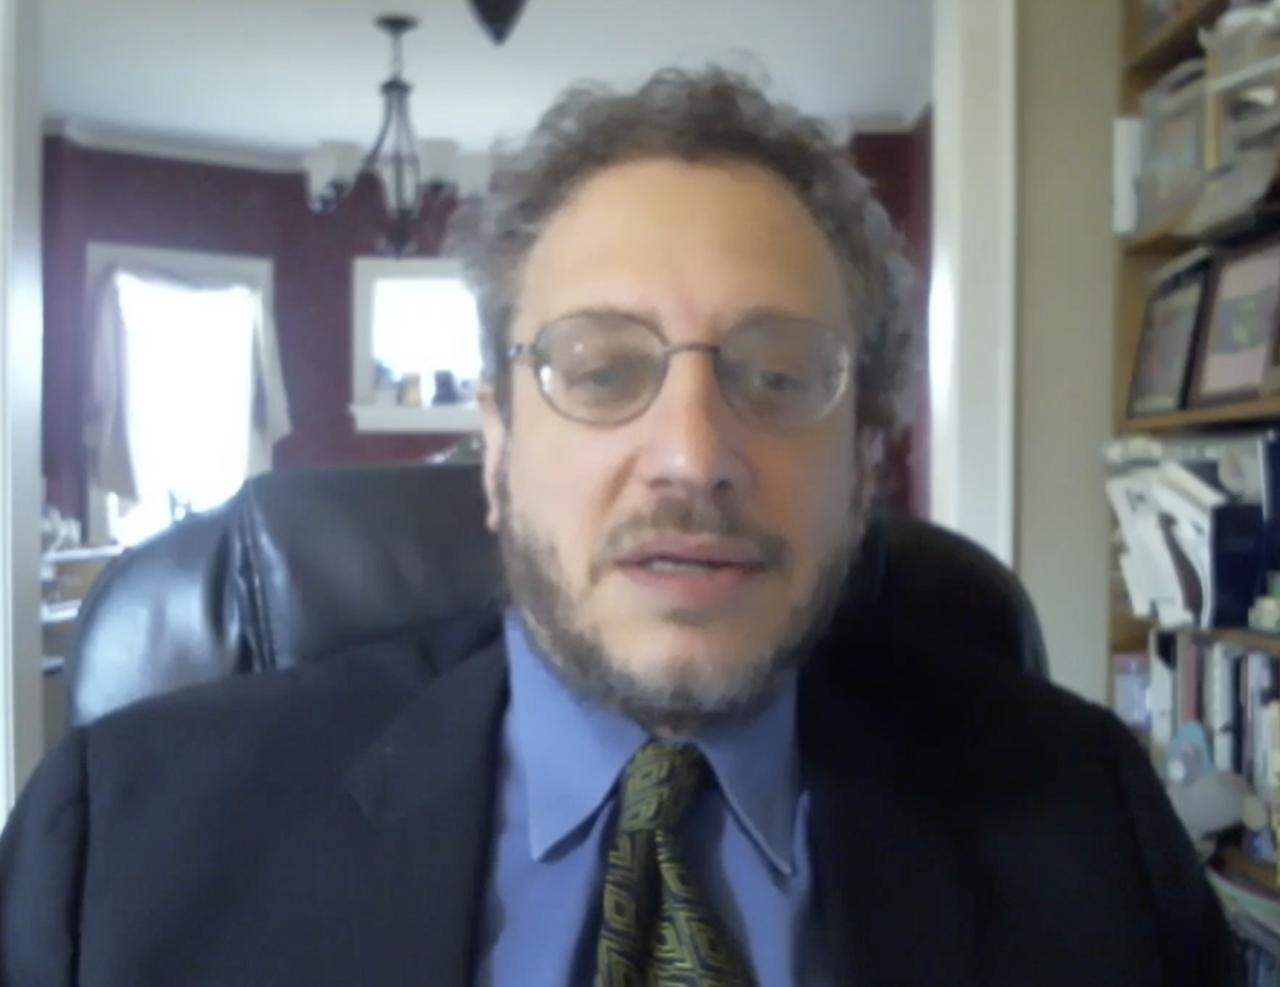 Northern Kentucky University law professor Ken Katkin